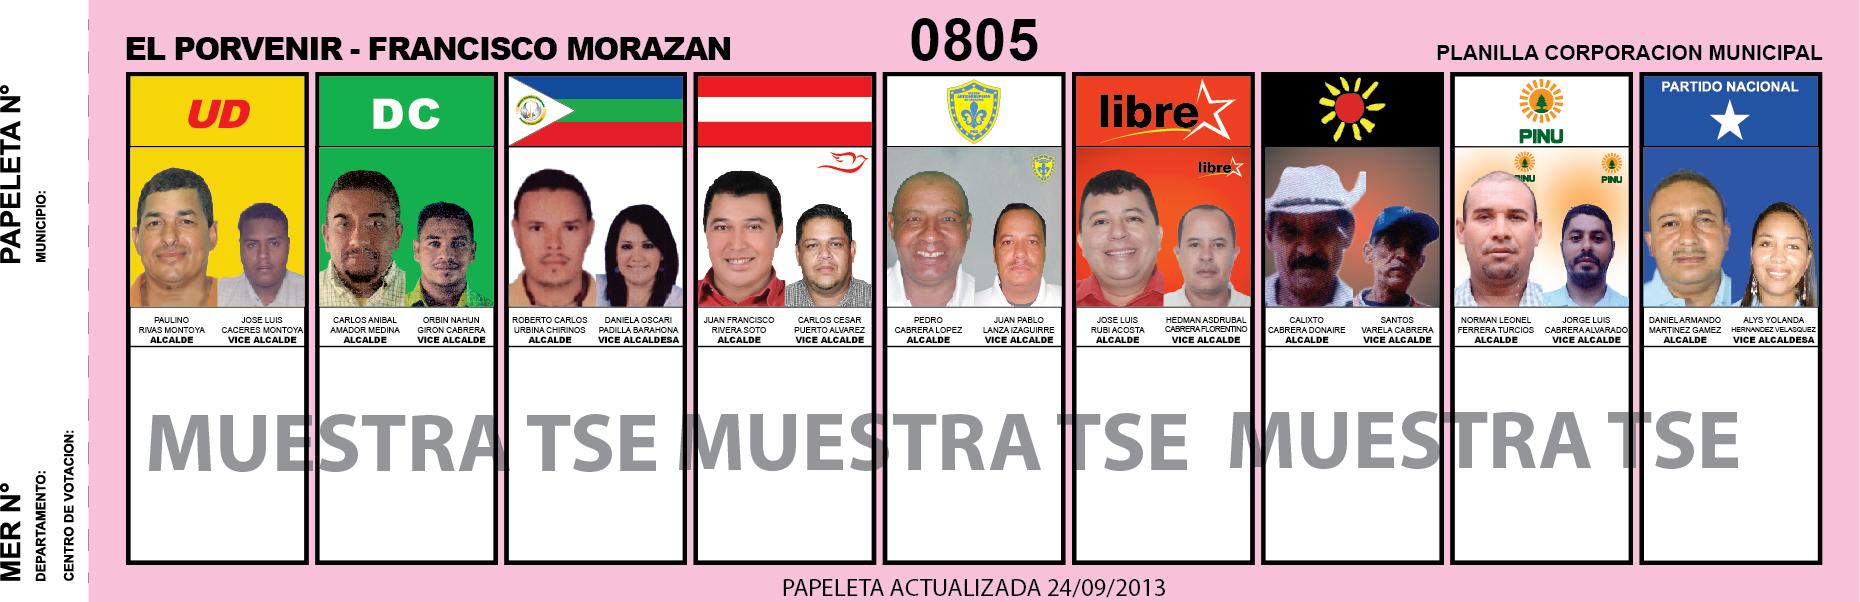 CANDIDATOS 2013 MUNICIPIO EL PORVENIR - FRANCISCO MORAZAN - HONDURAS